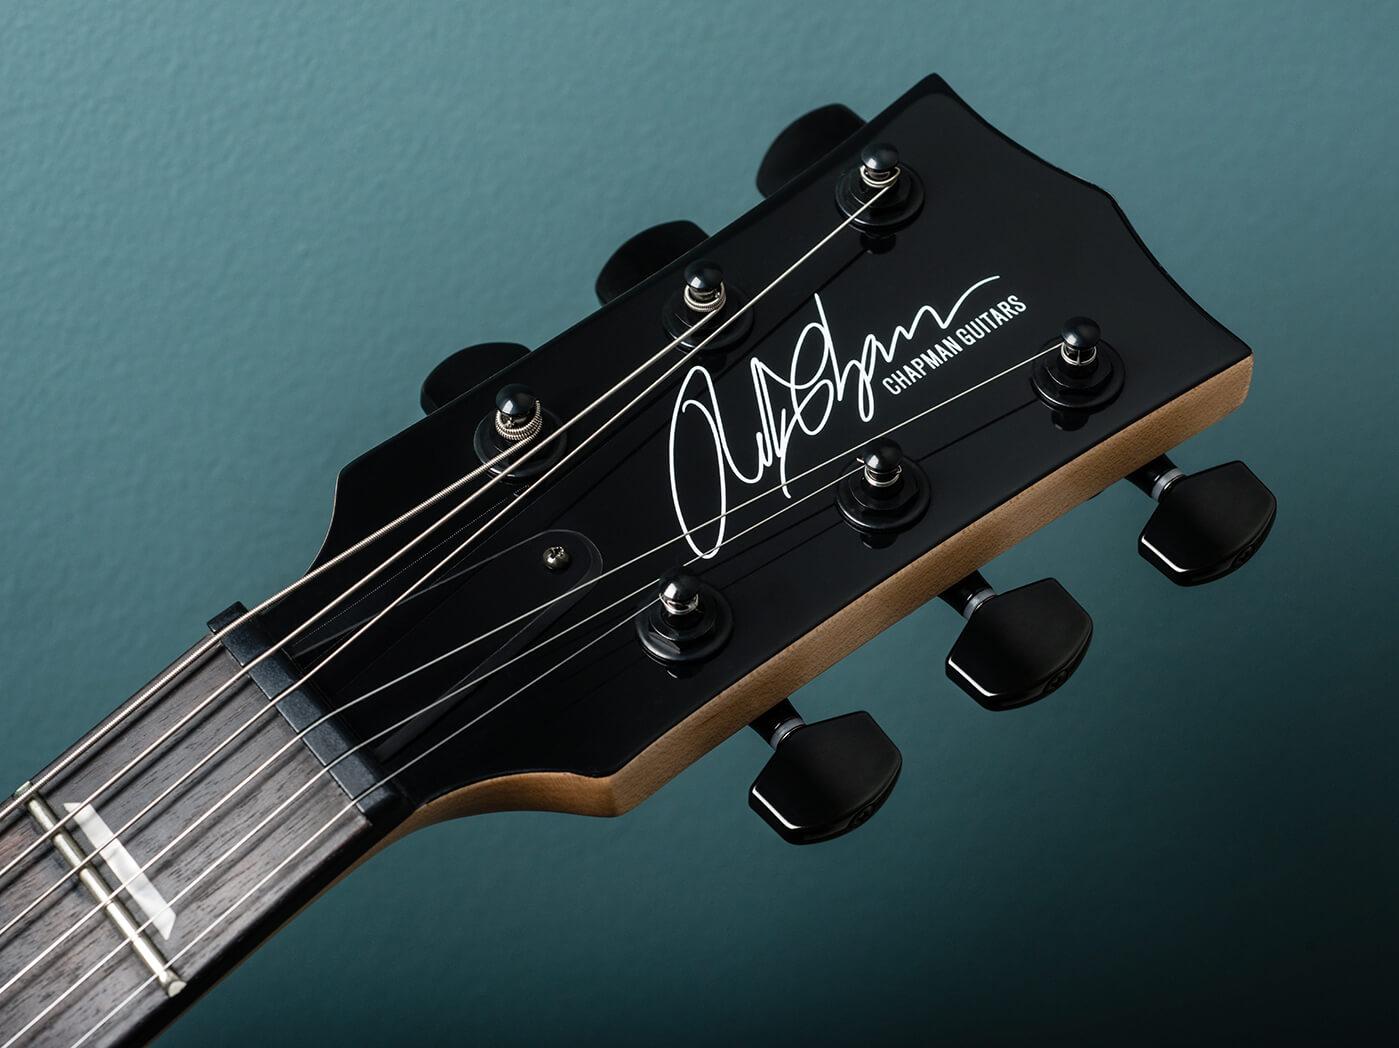 Chapman Guitars V2 ML2 Modern Standard headstock